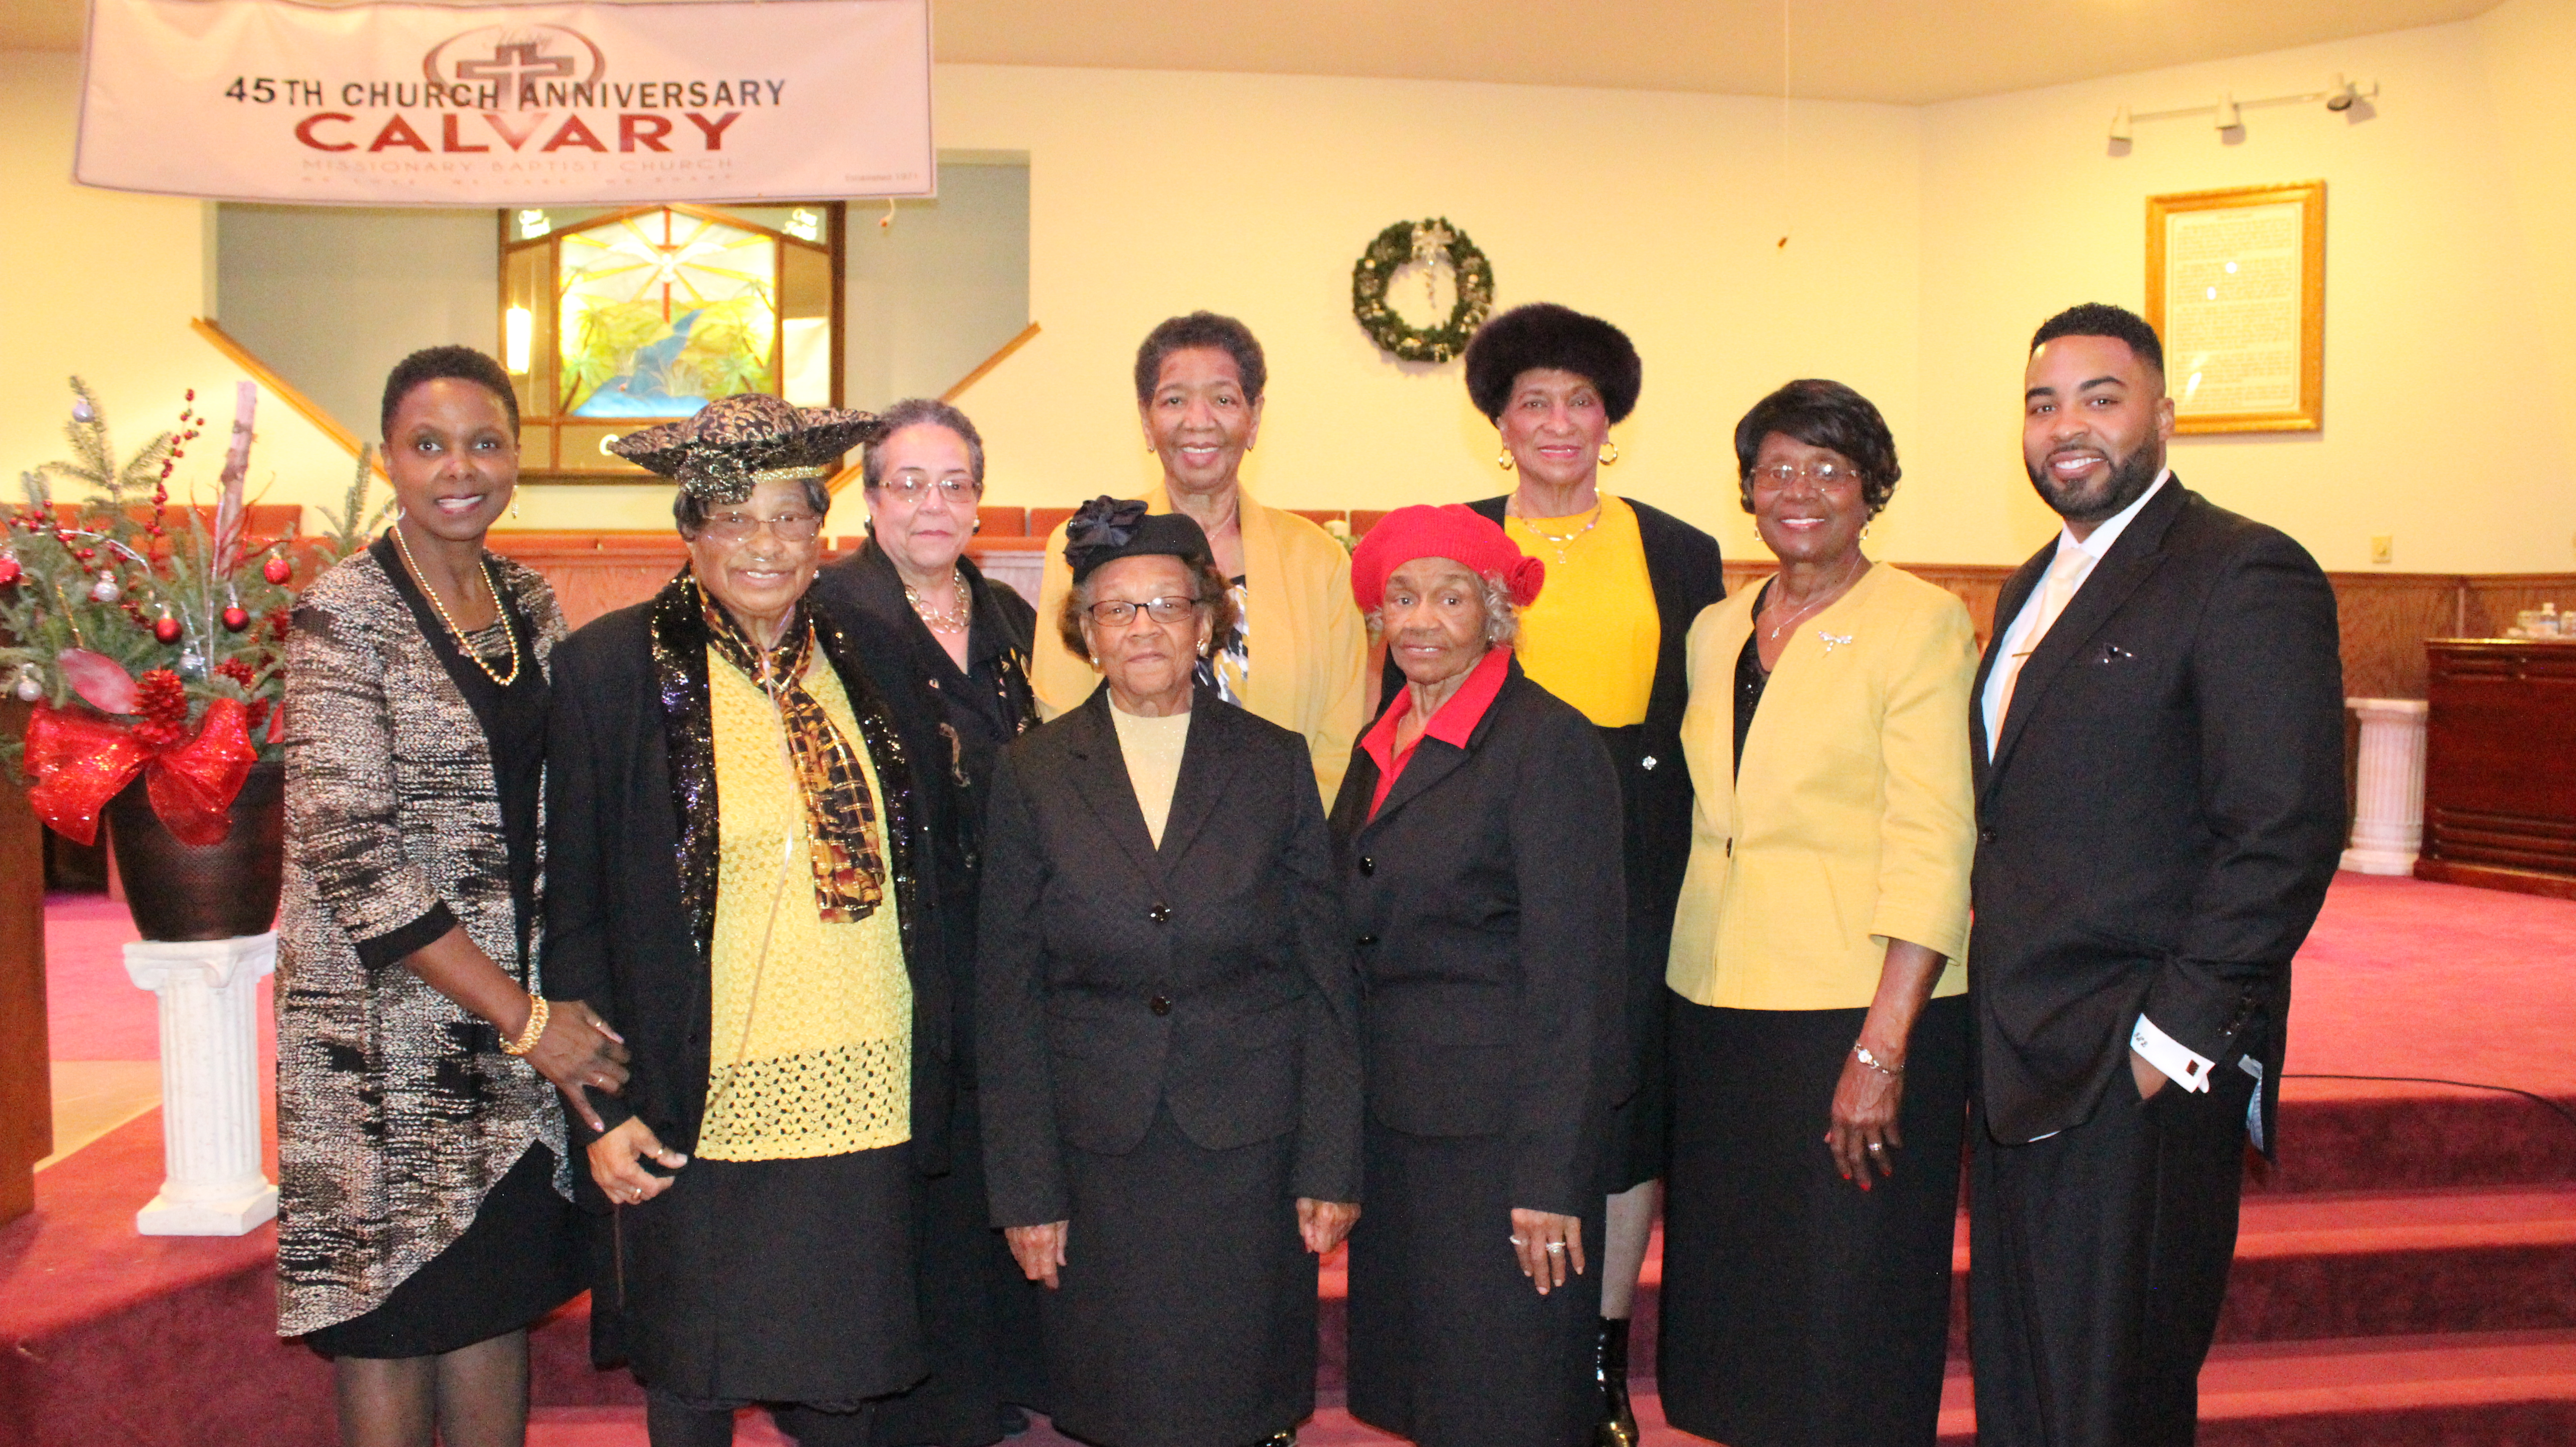 Church Groups